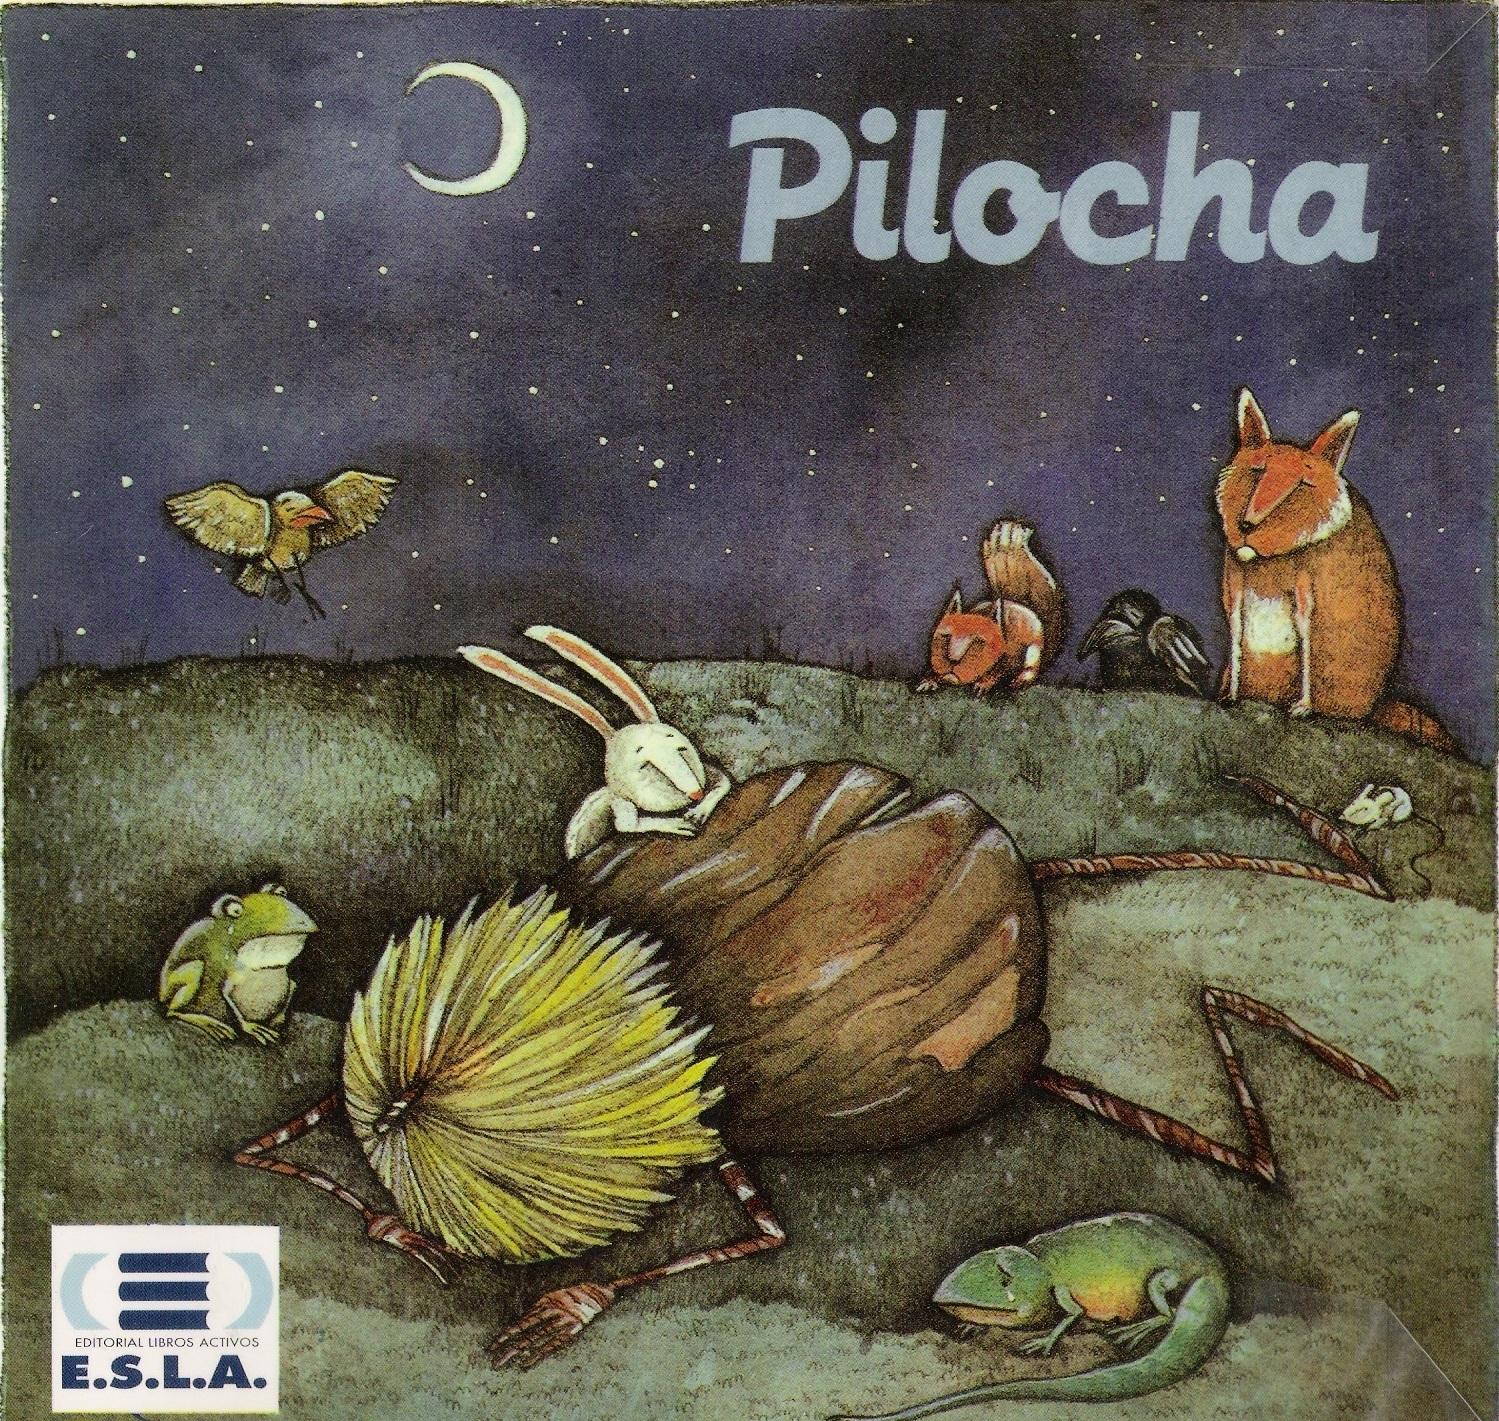 PILOCHA